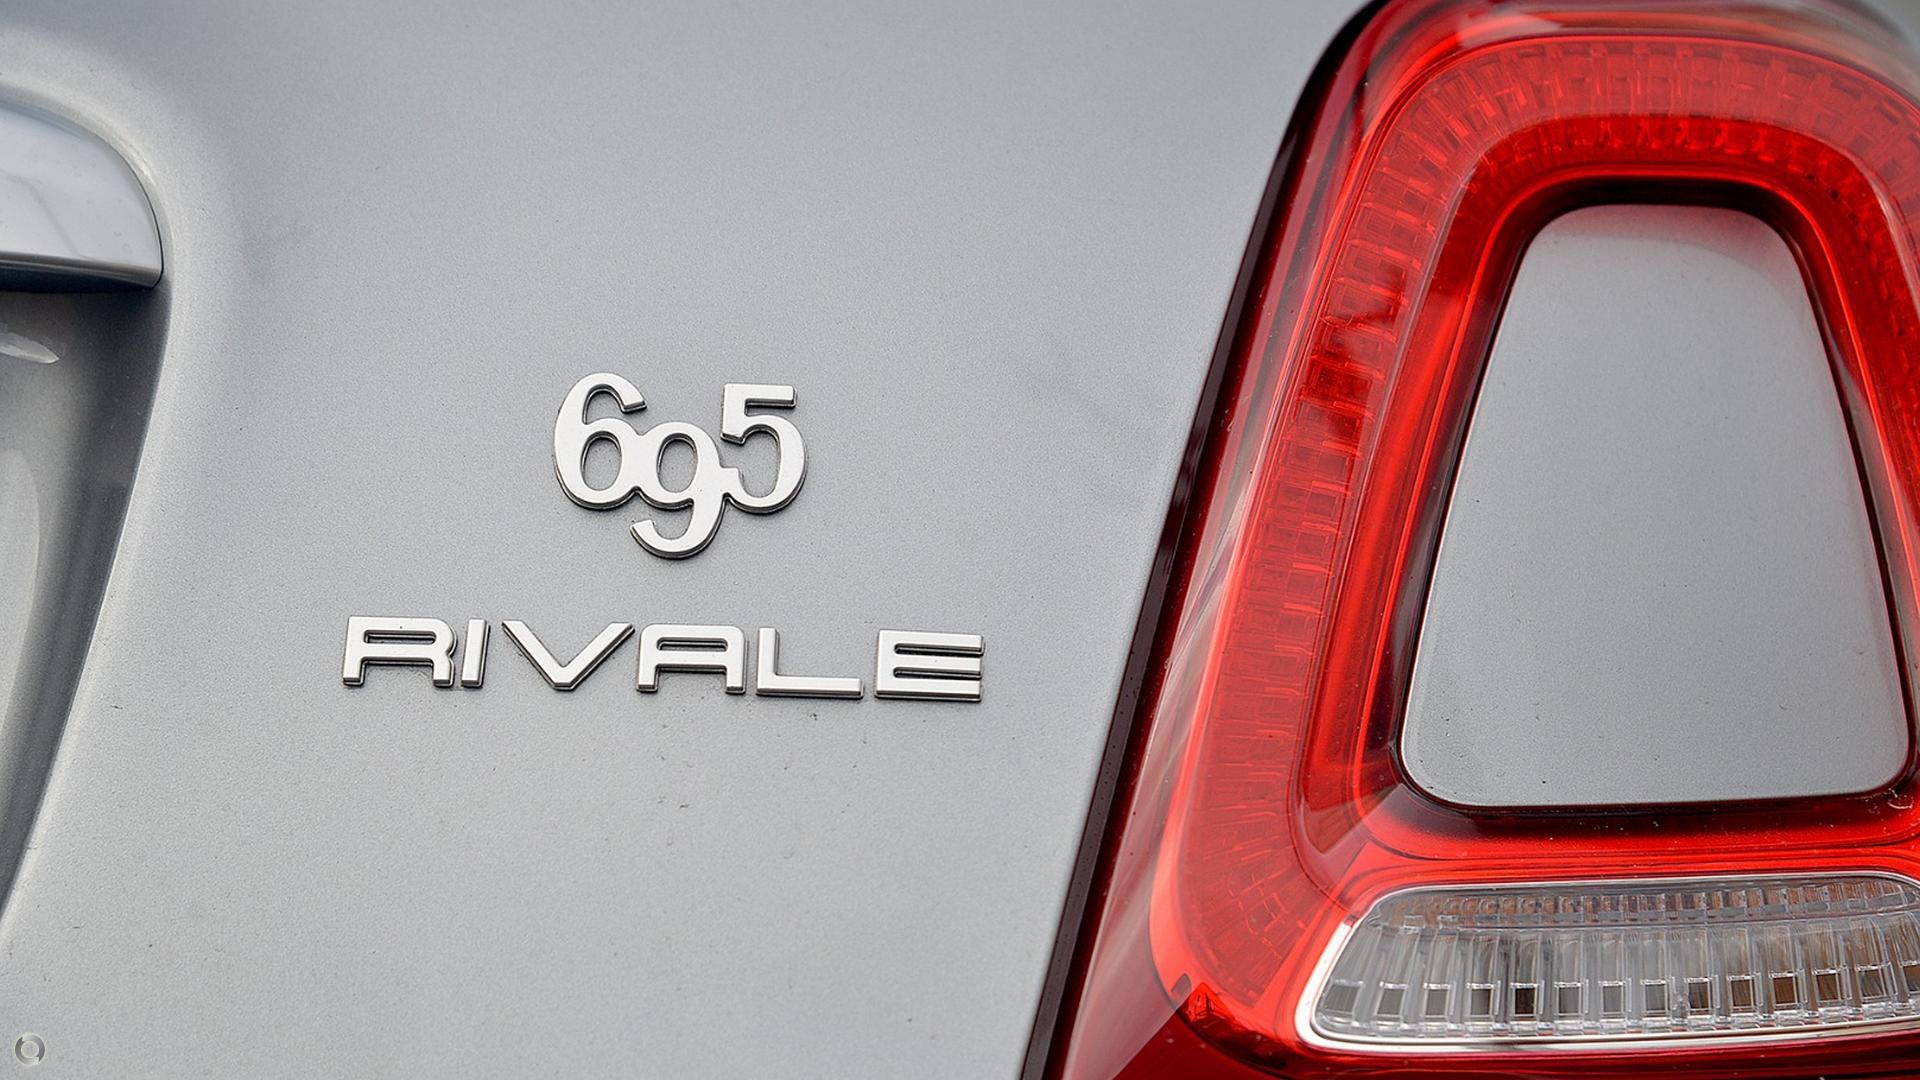 2019 Abarth 695 Rivale Series 4